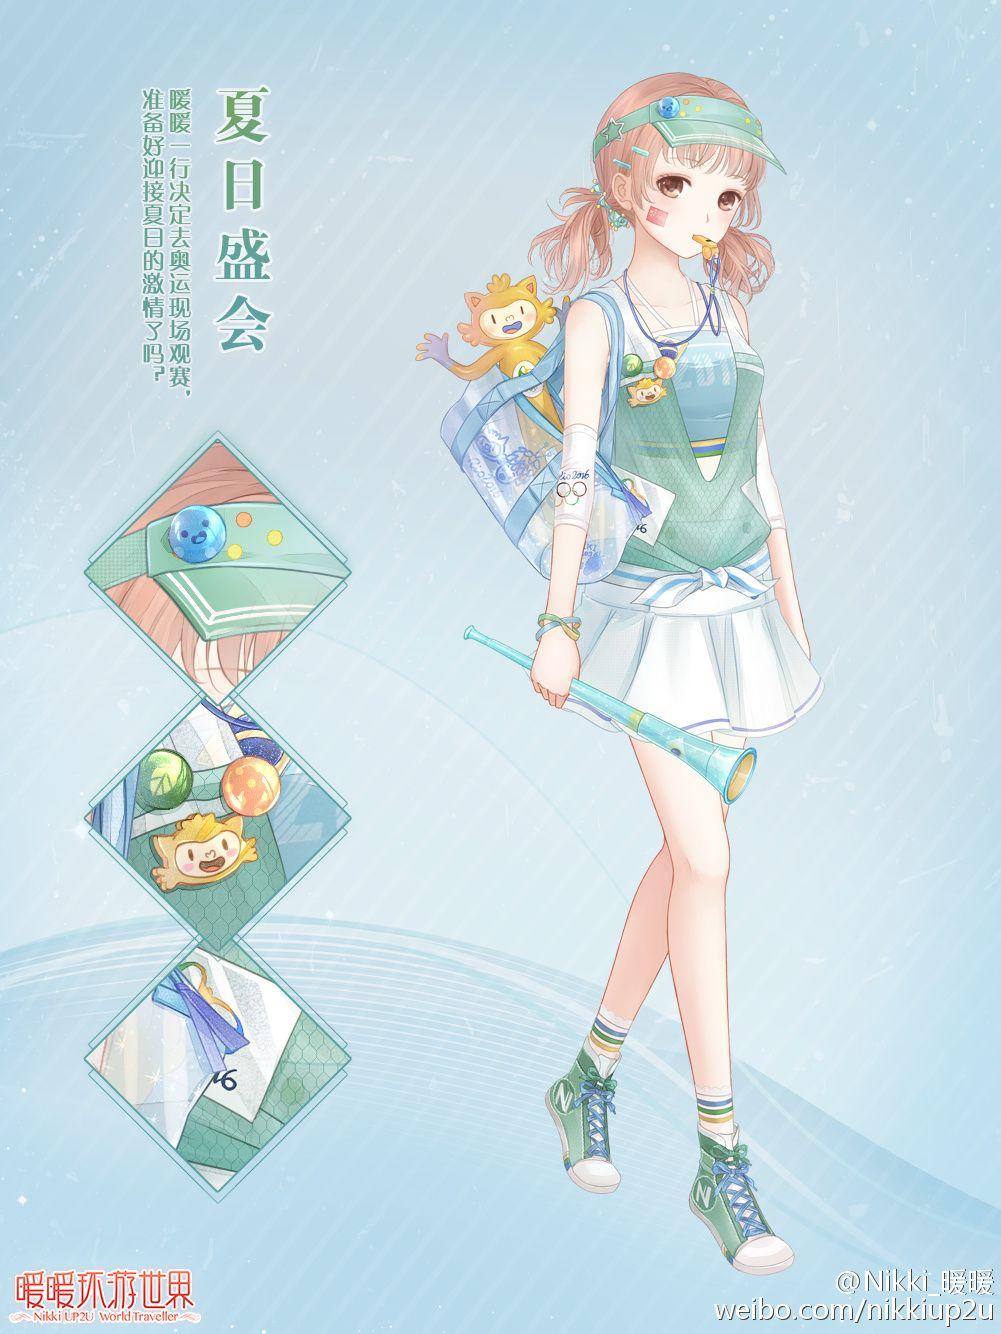 Dress up diary · anime chibi · 全部微博